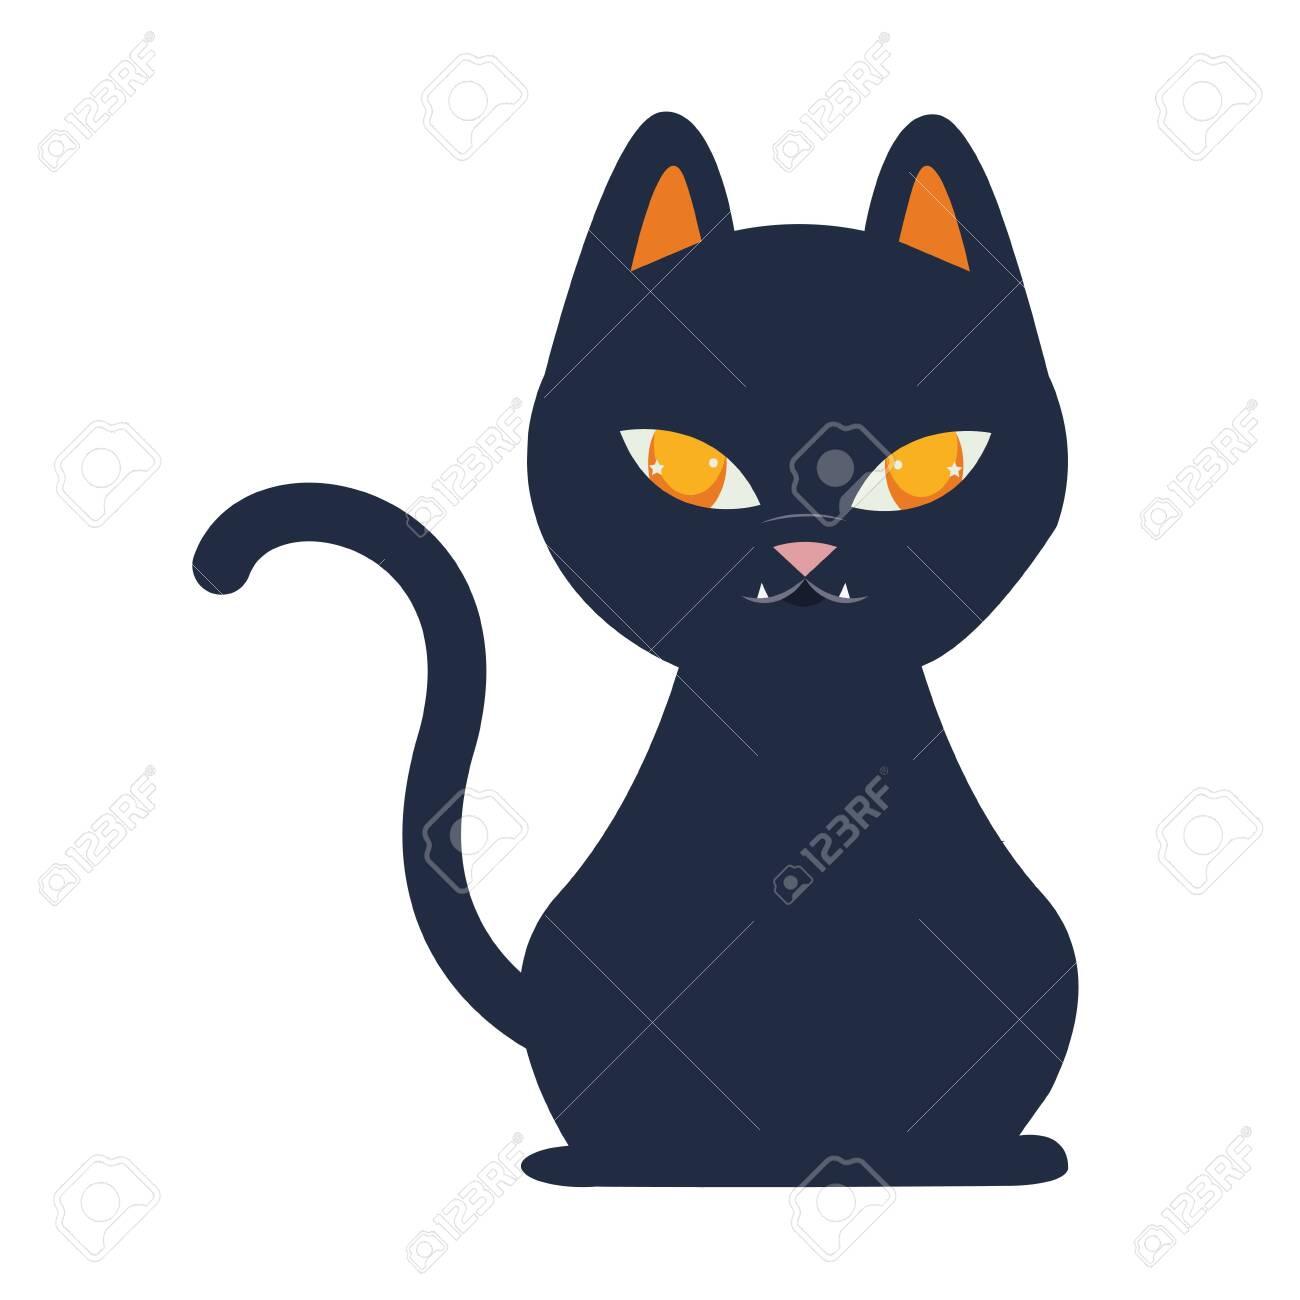 halloween cat mascot seasonal icon vector illustration design - 134029181